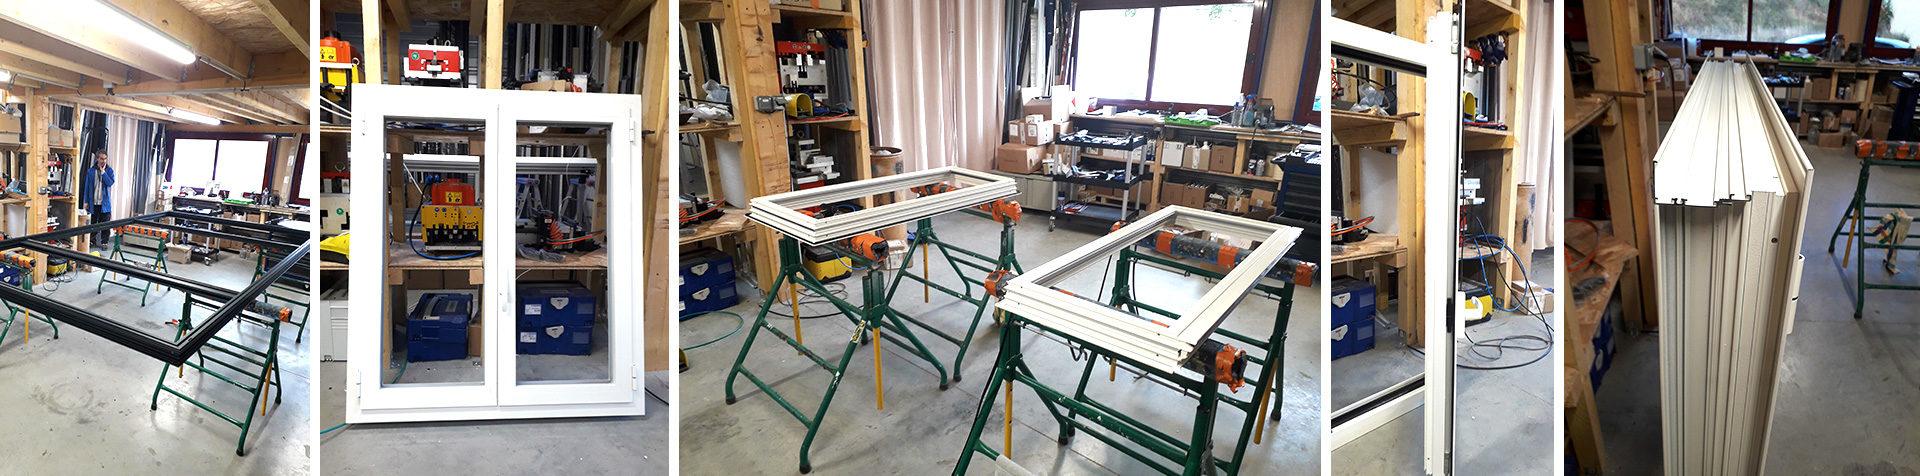 https://www.decarlo-mione.com/wp-content/uploads/2021/03/atelier-menuiserie-De-Carlo-Mione-1920x476.jpg